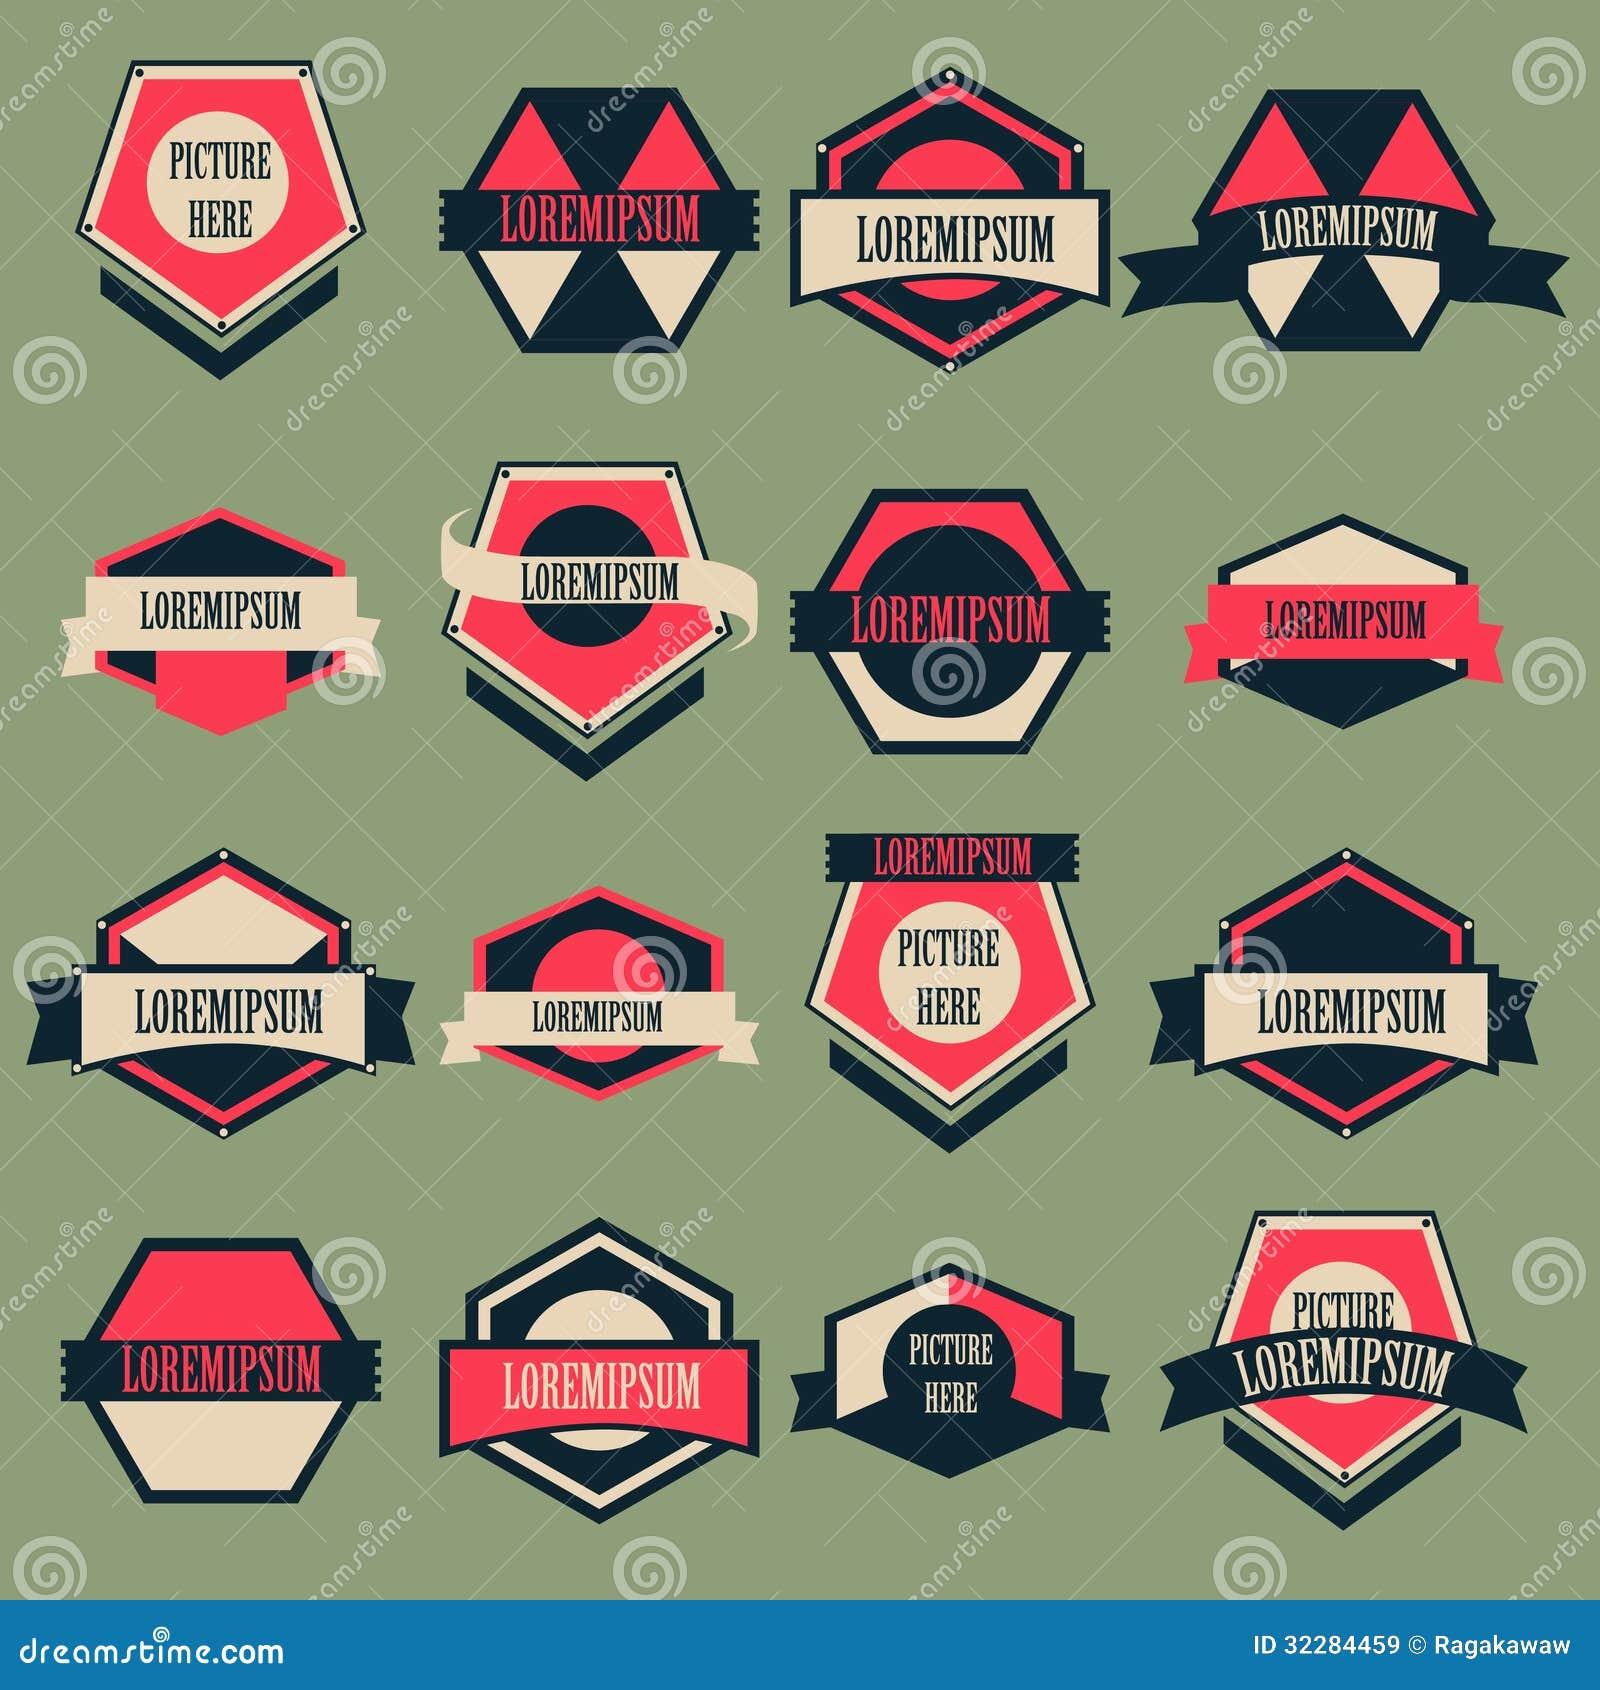 Vintage Logo Vector Set Royalty Free Stock Photography - Image ...